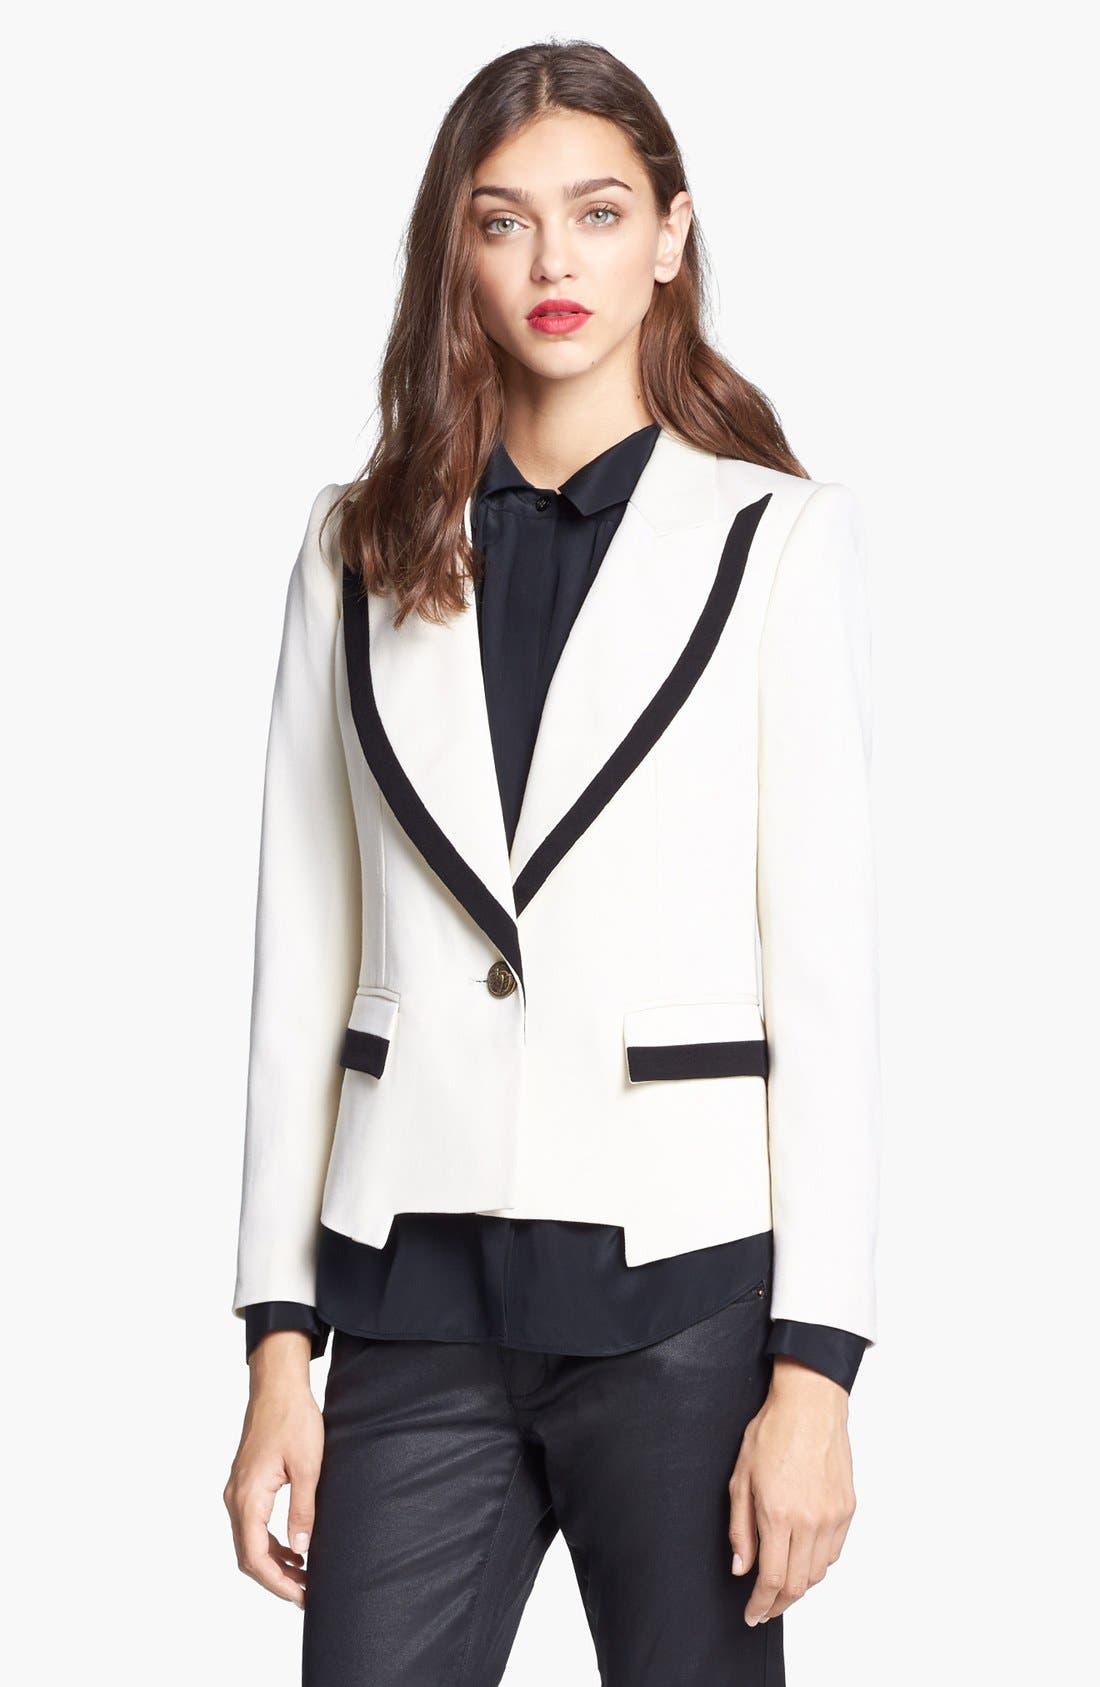 Alternate Image 1 Selected - Rachel Zoe 'Foster' Peak Lapel Single Button Jacket